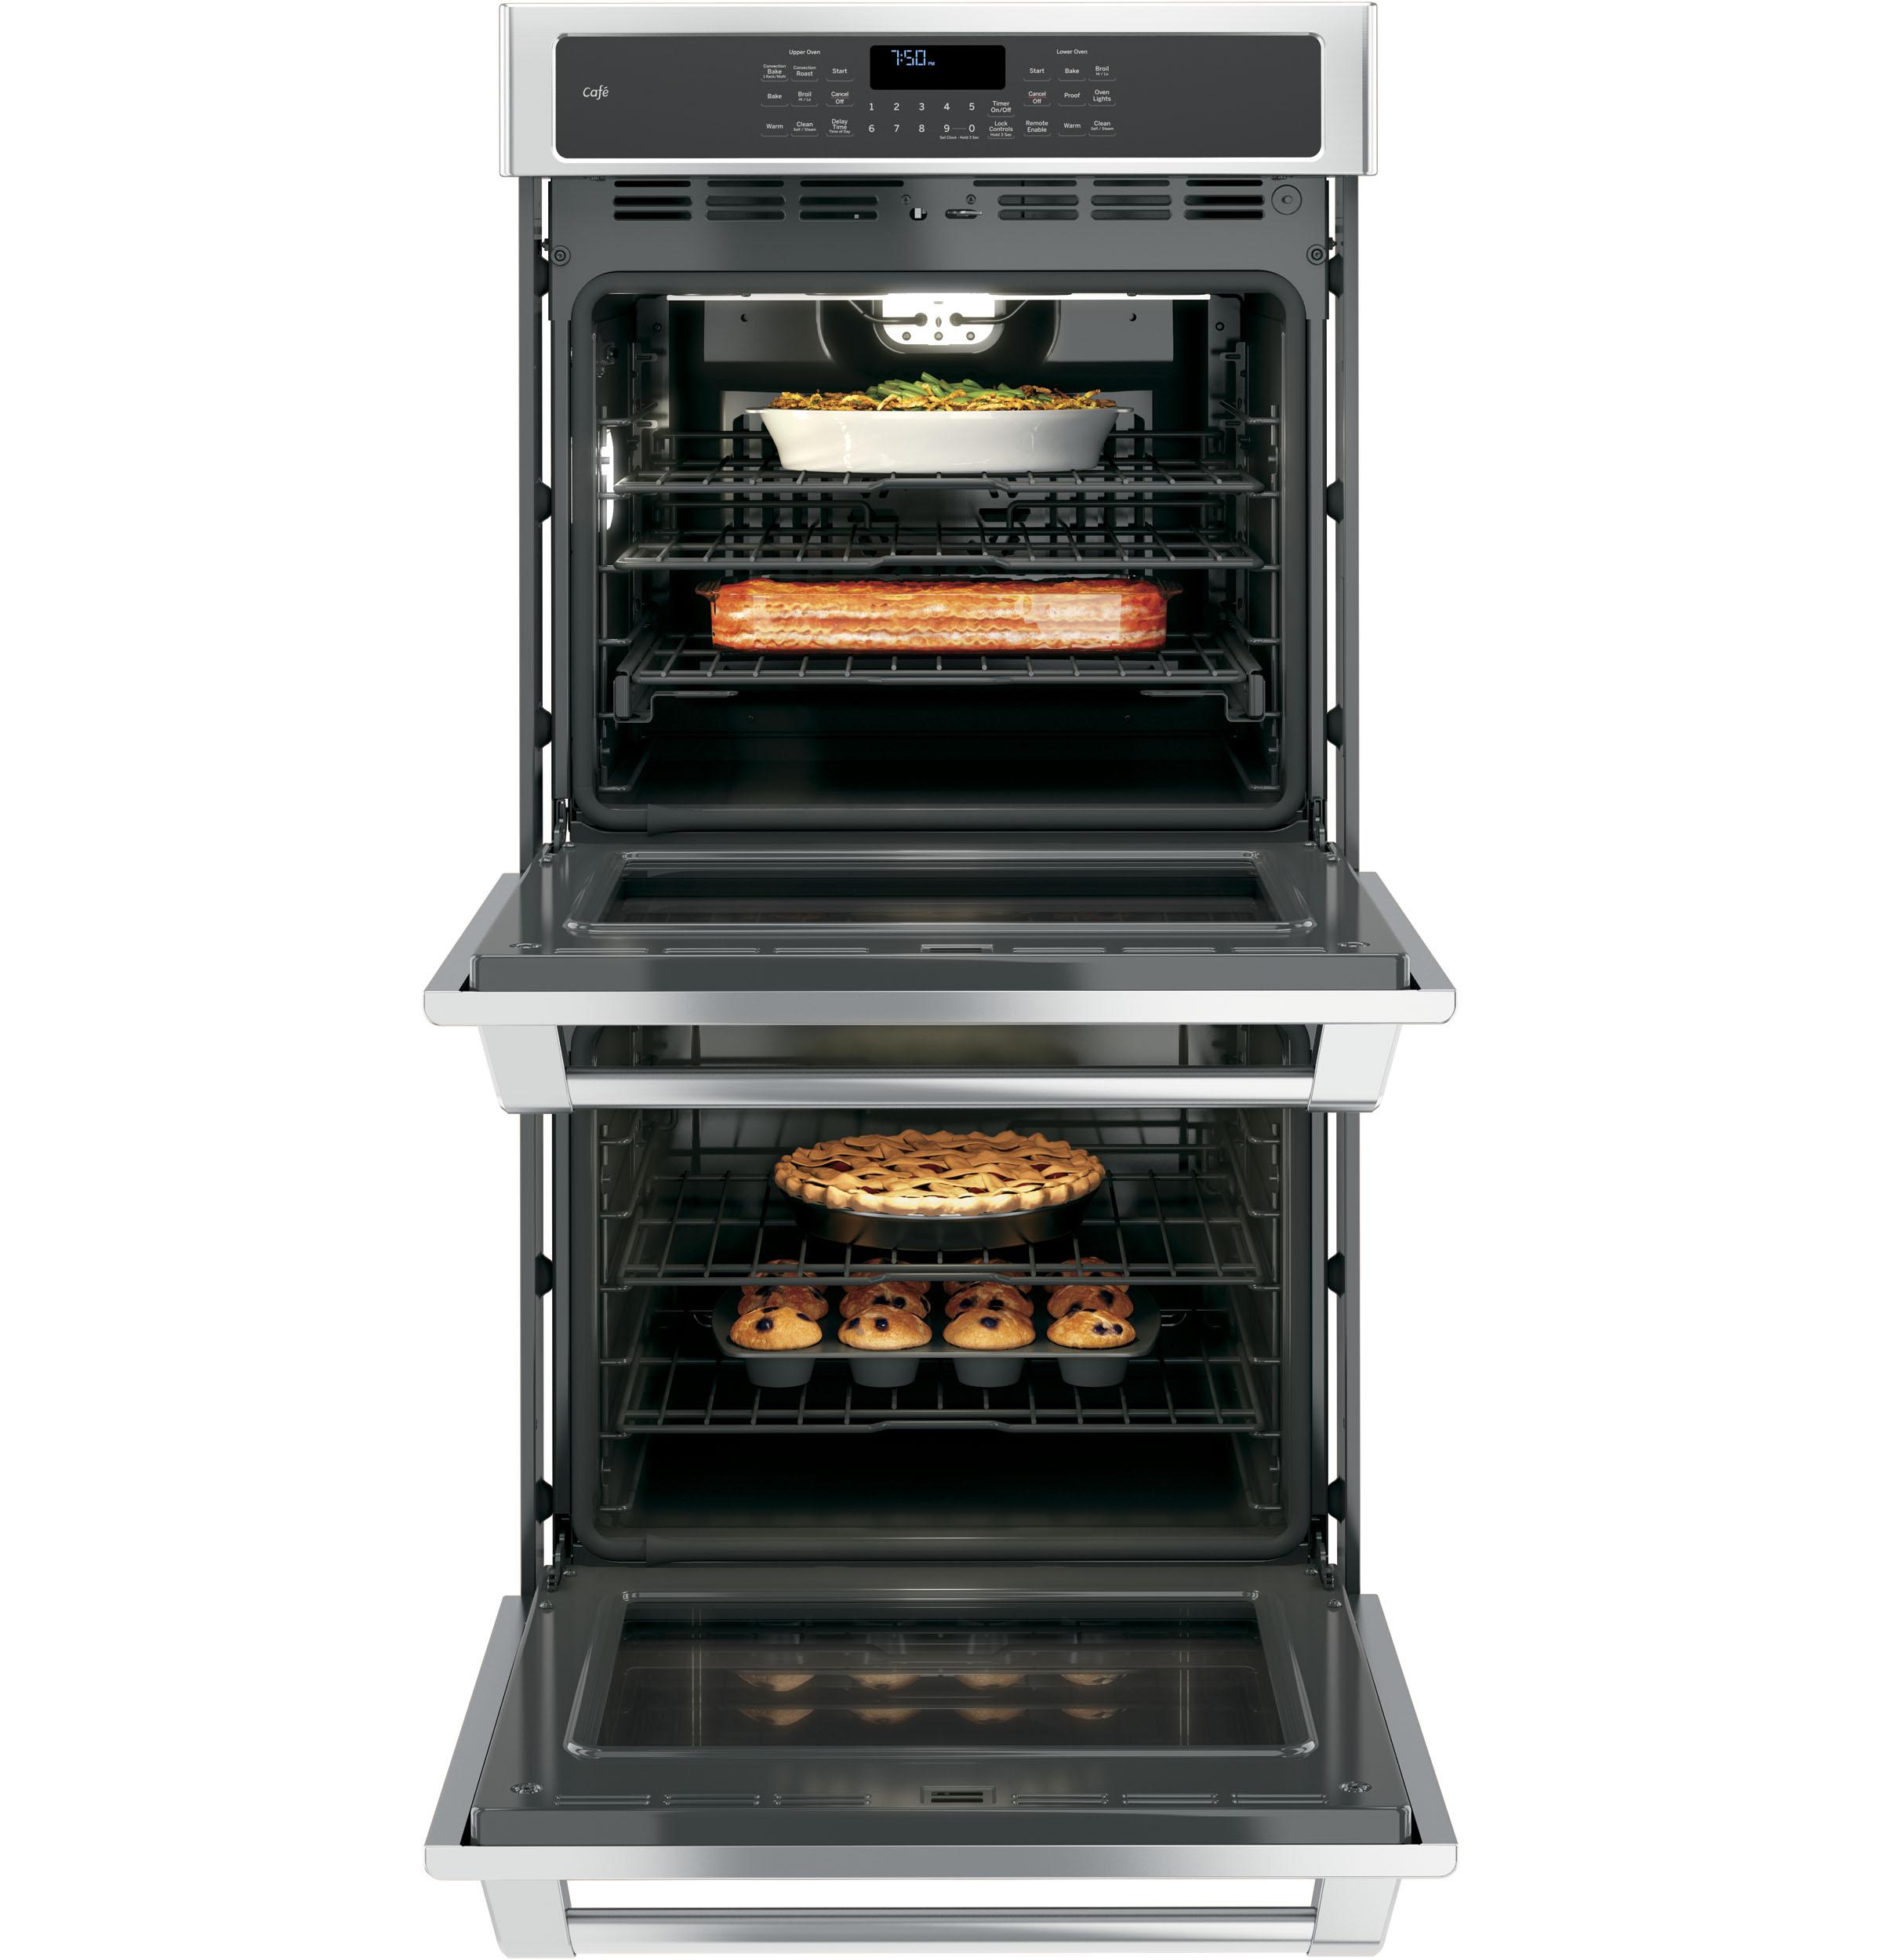 Model: CK7500SHSS | GE Café™ Series 27